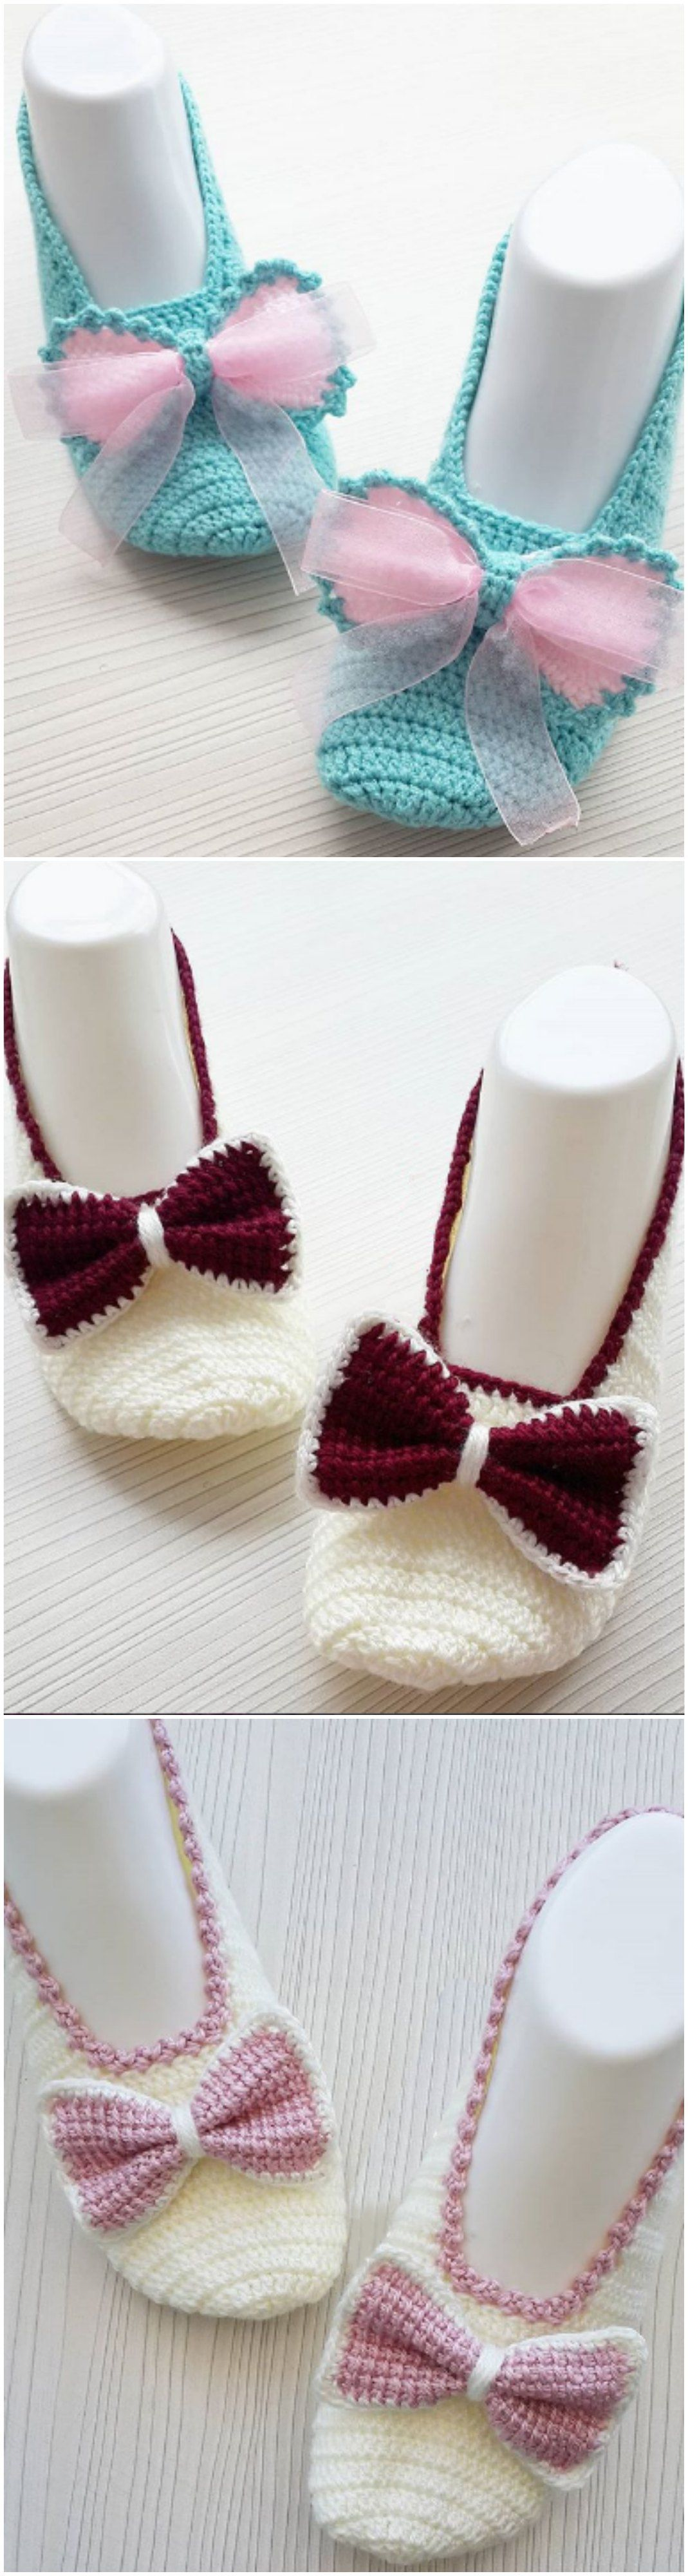 Crochet Bow Slippers | Anillas de latas | Pinterest | Sandalias boho ...